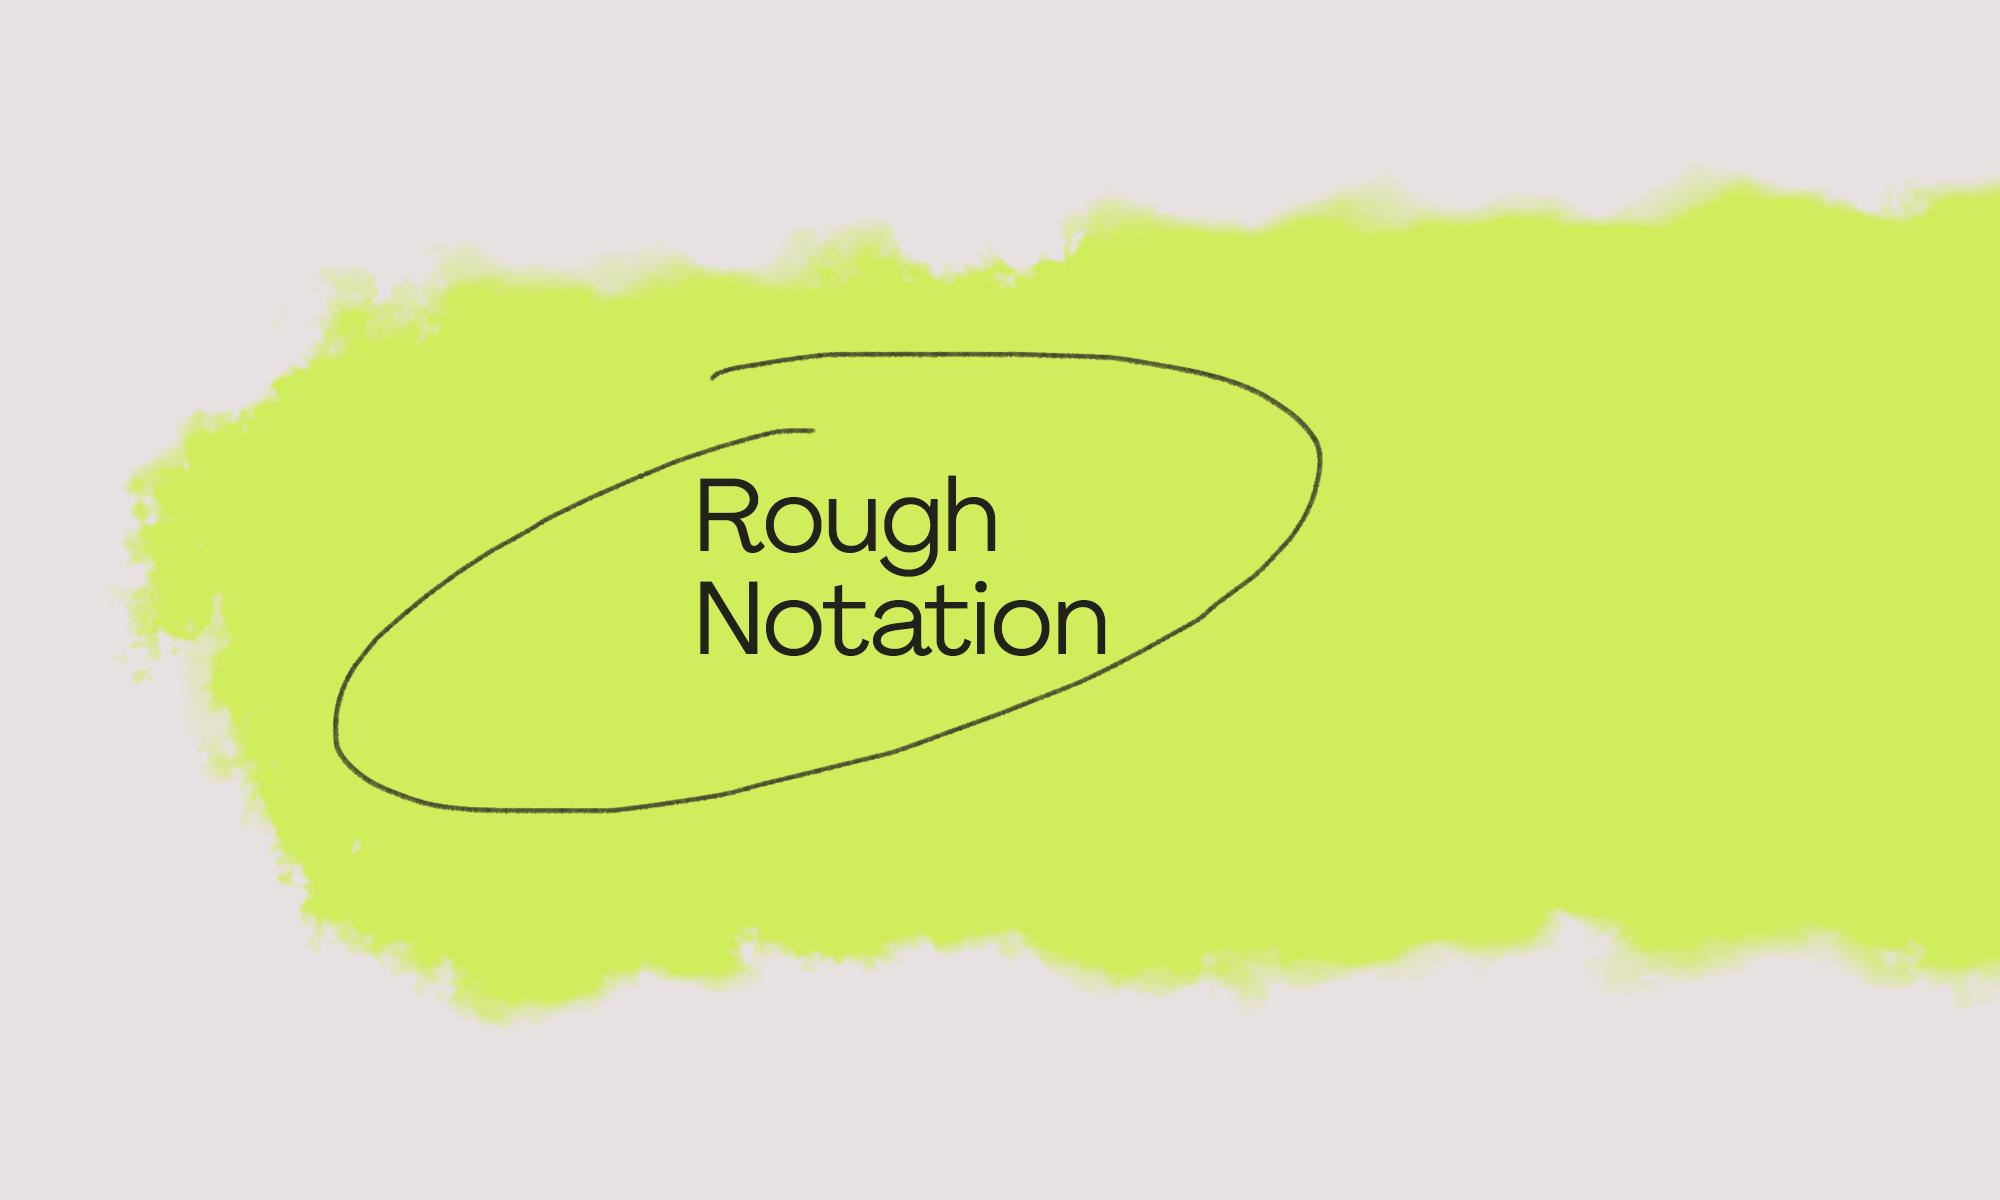 Rough Notation